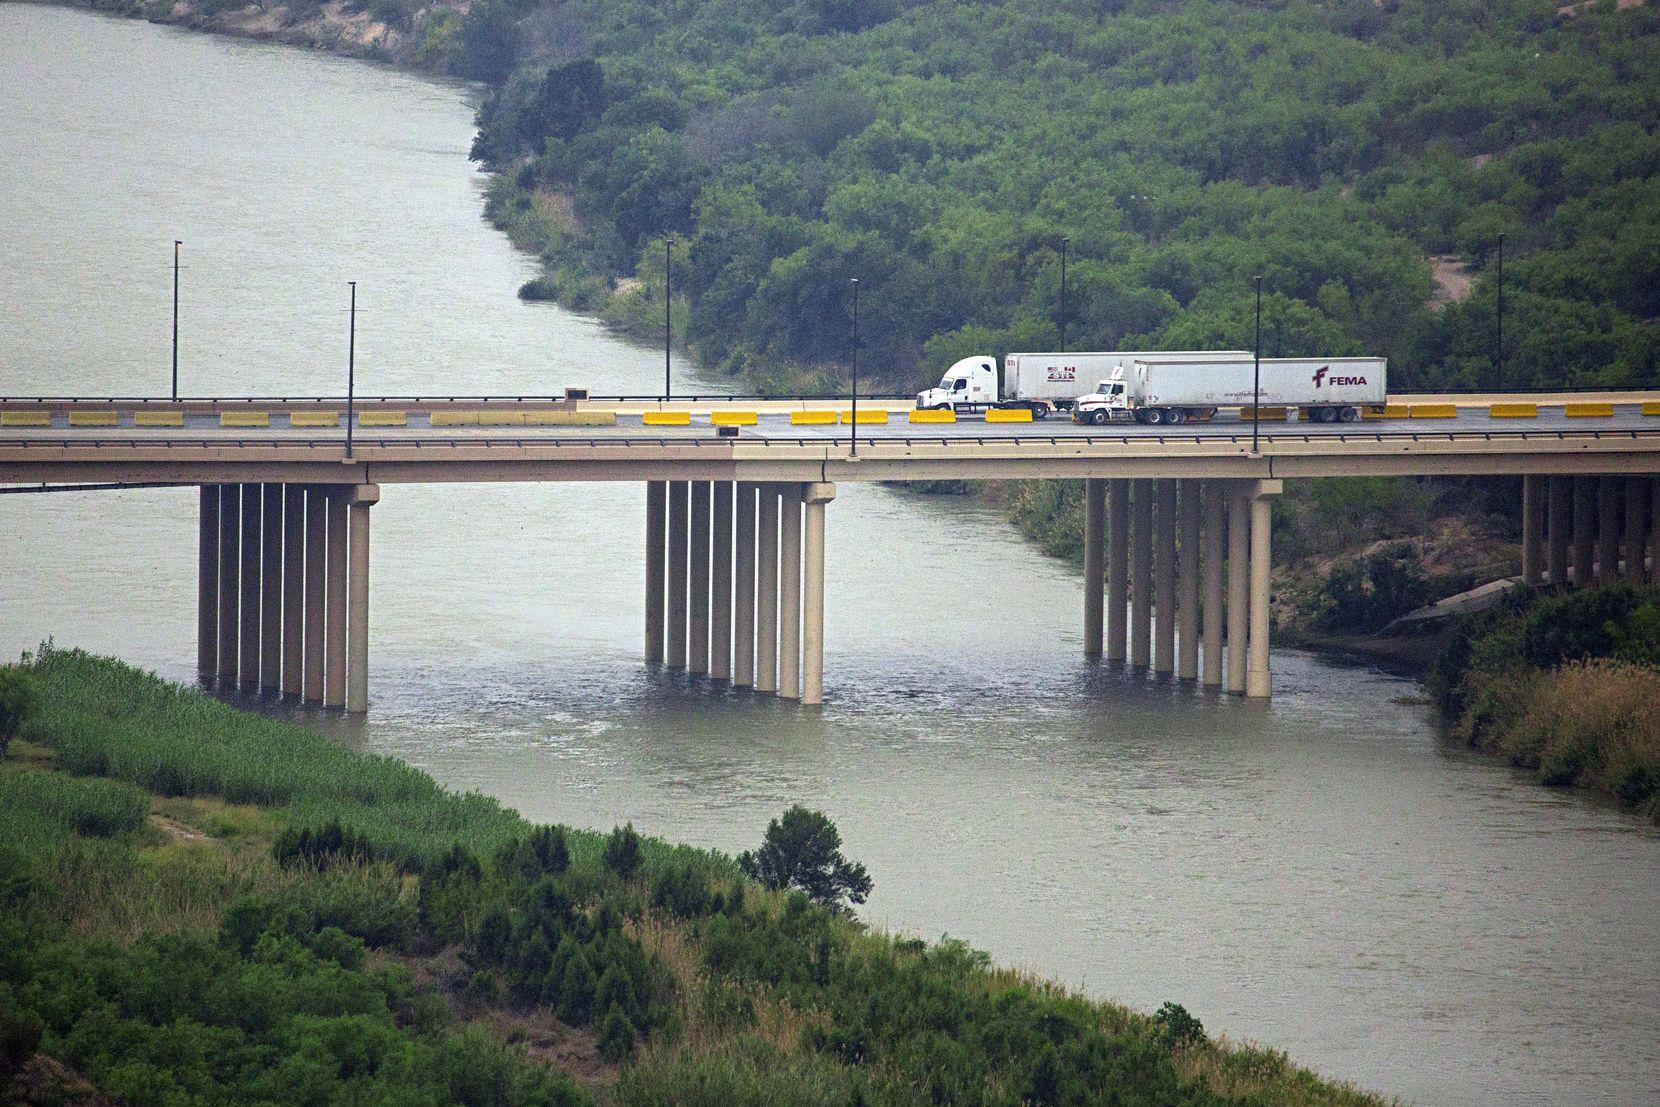 Trucks cross over the Laredo World Trade Bridge between Nuevo Laredo, Mexico (right) and the United States.